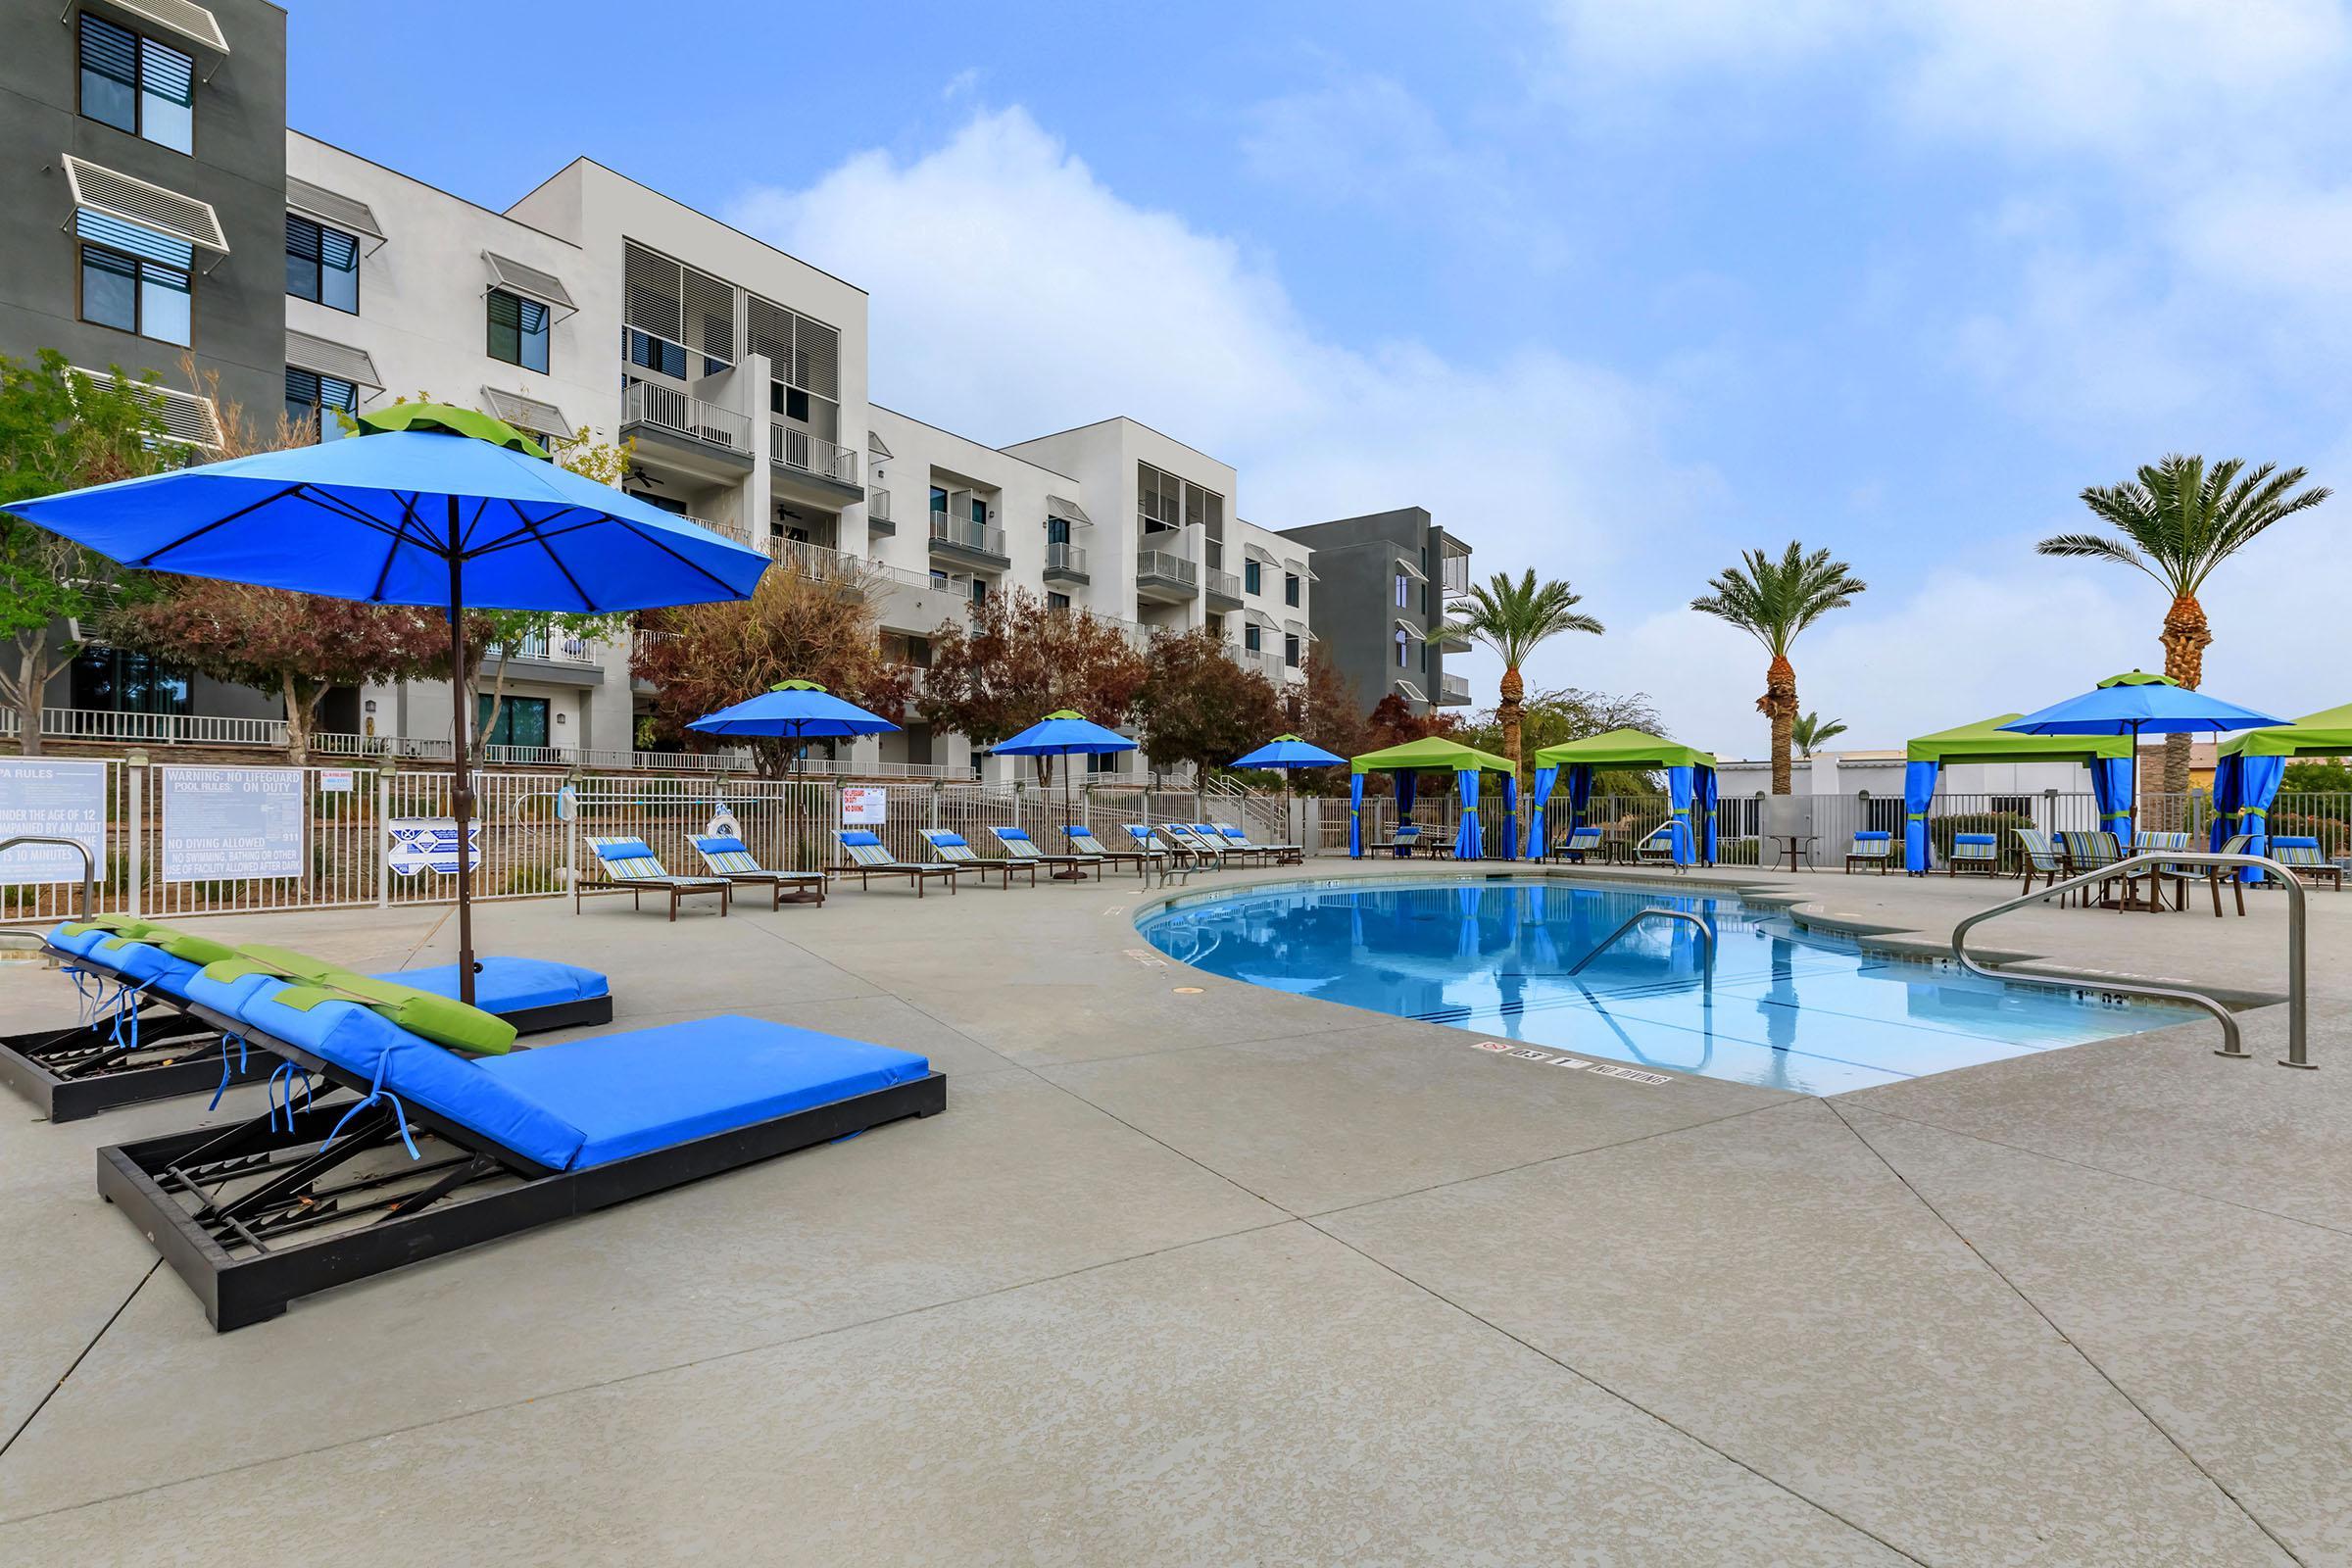 a blue umbrella sitting next to a pool